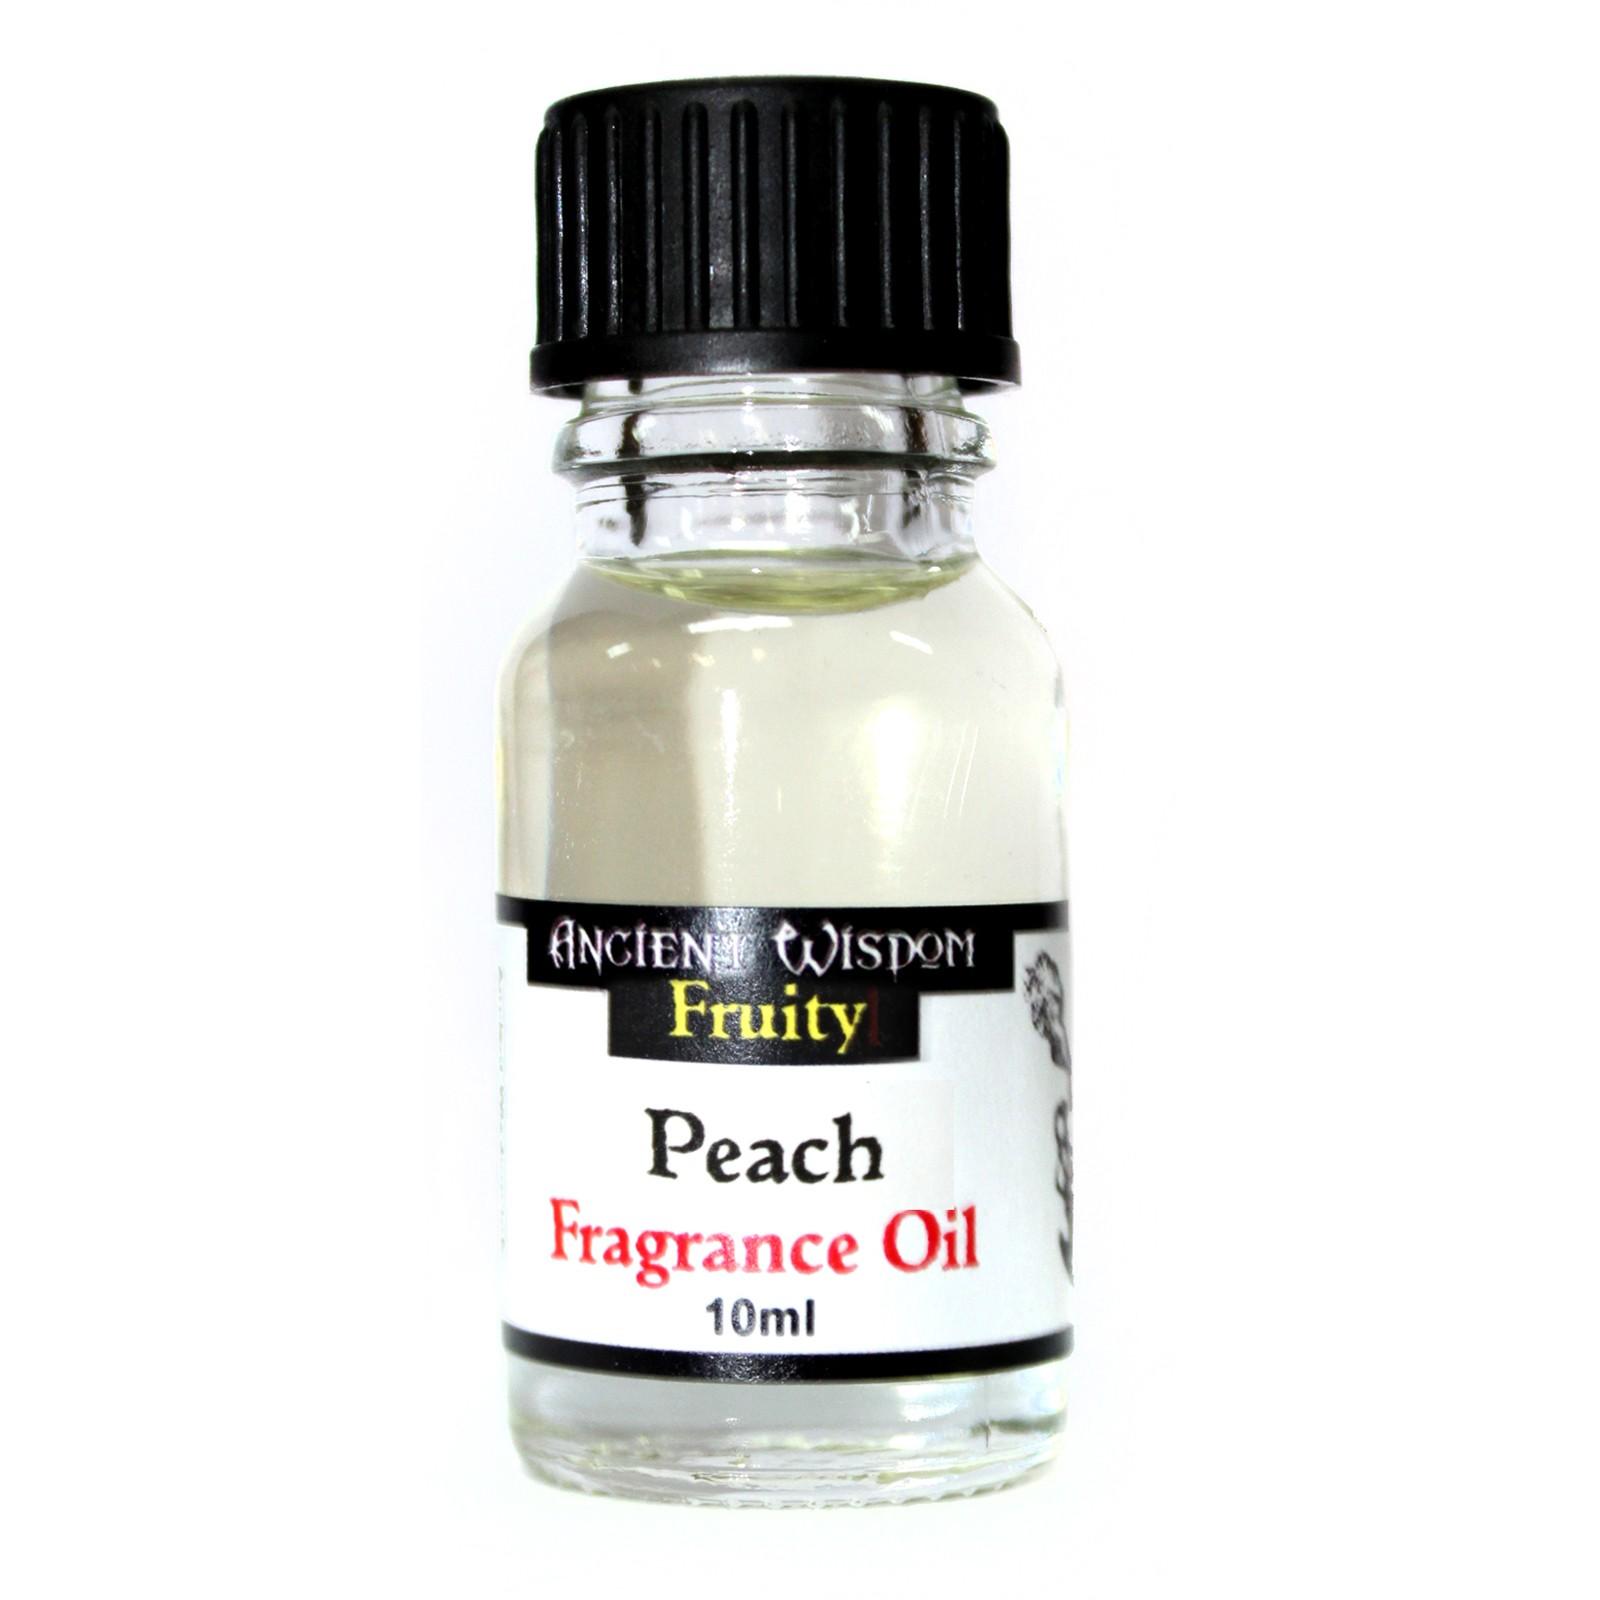 10ml Peach Fragrance Oil